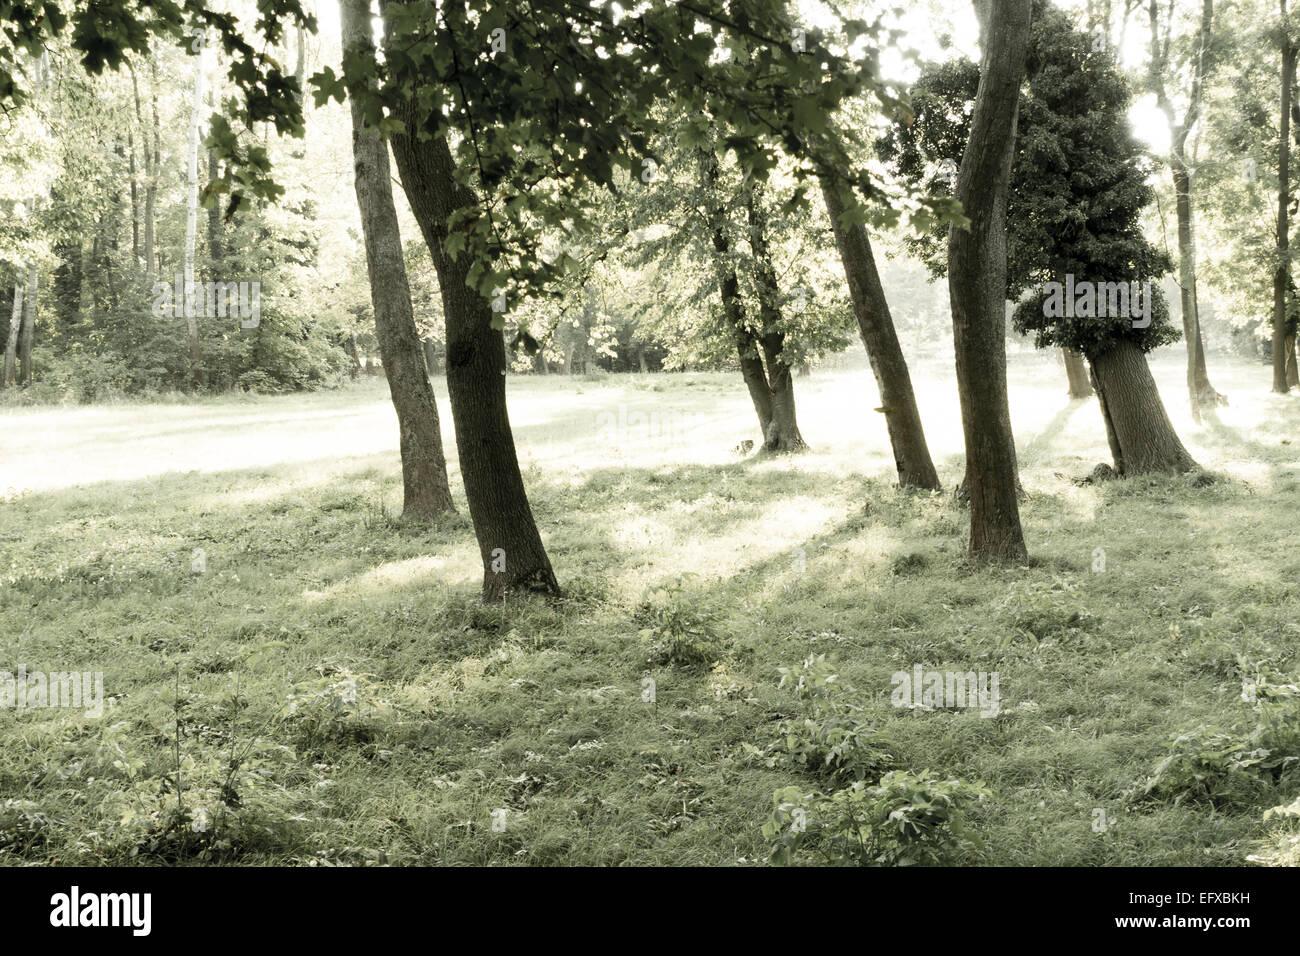 Harrachpark, Bruck an der Leitha, Austria, Lower Austria - Stock Image